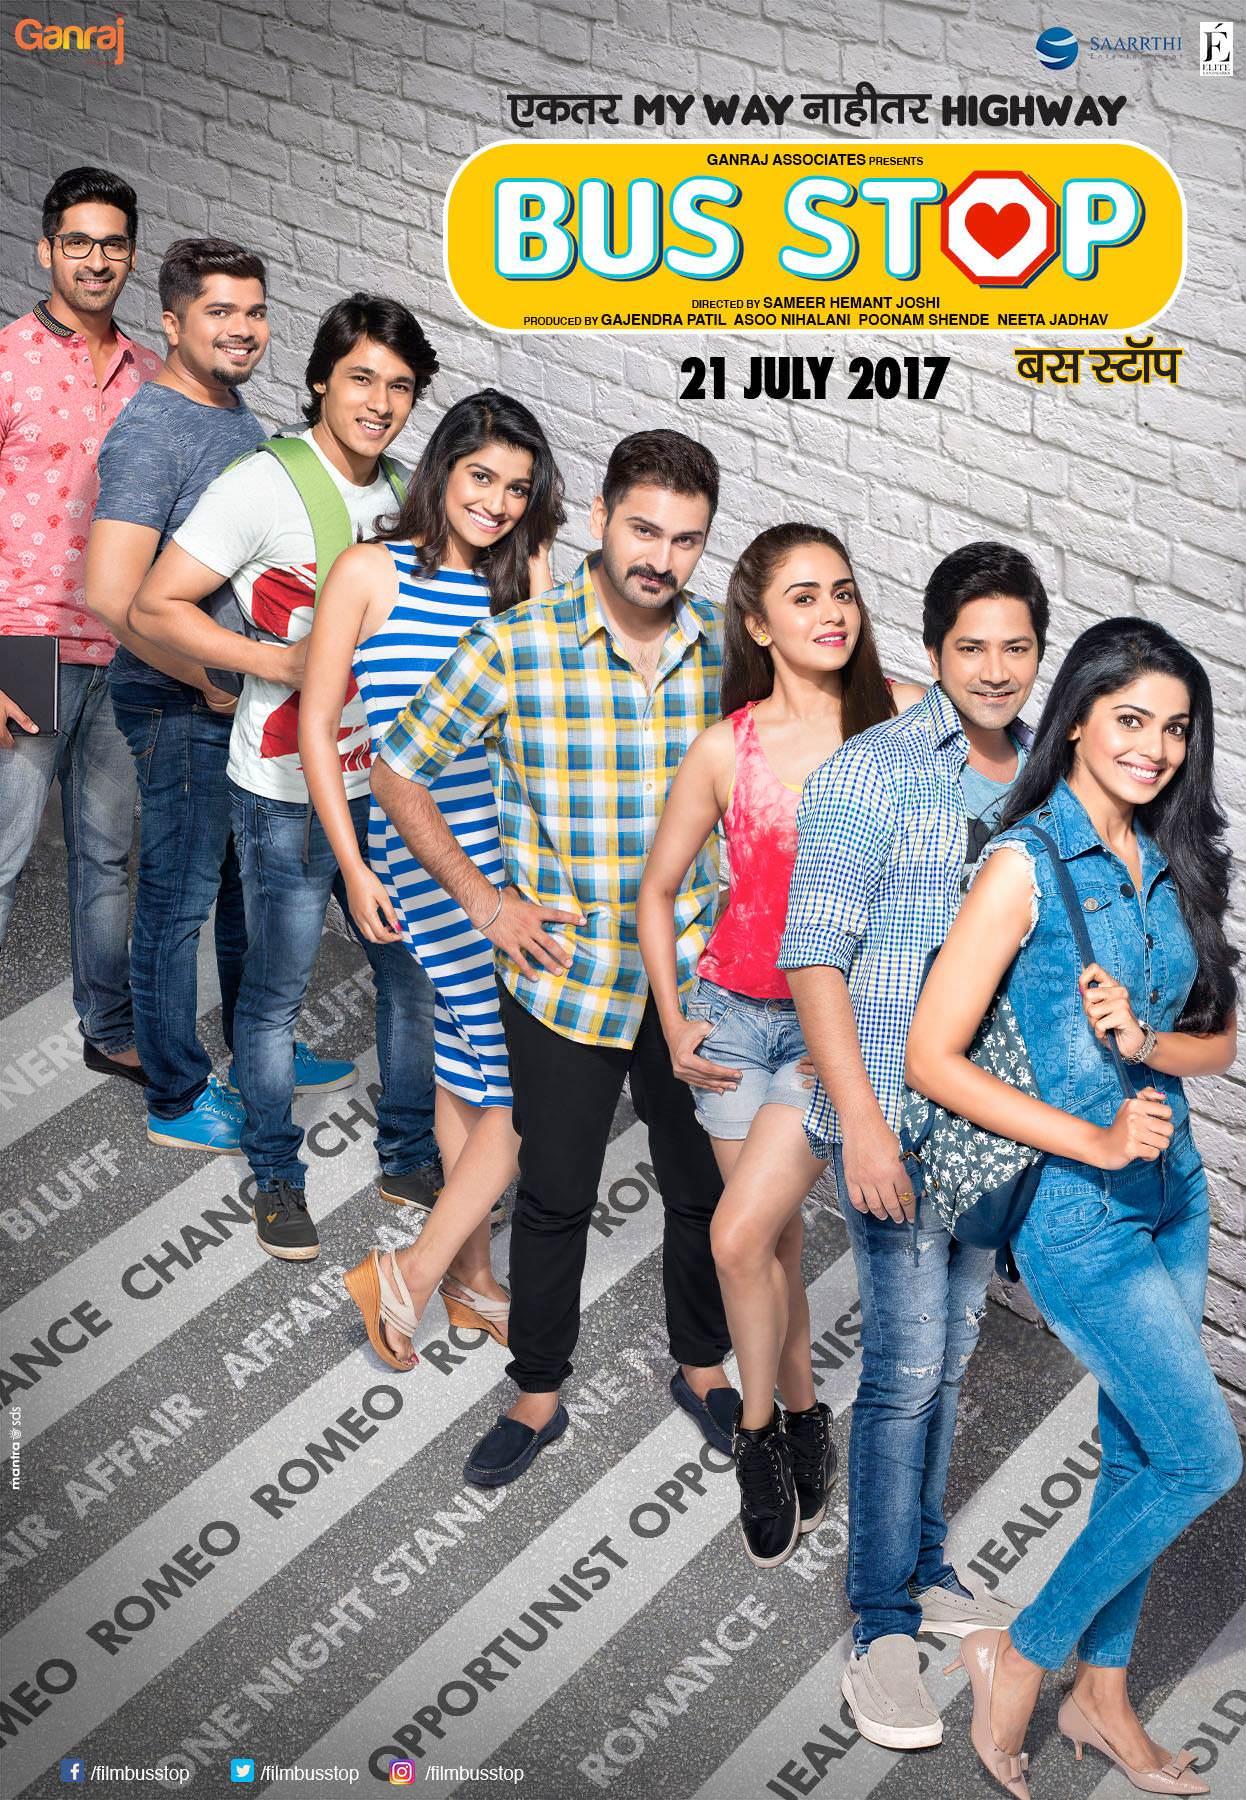 bus stop marathi movie cast trailer release date wiki